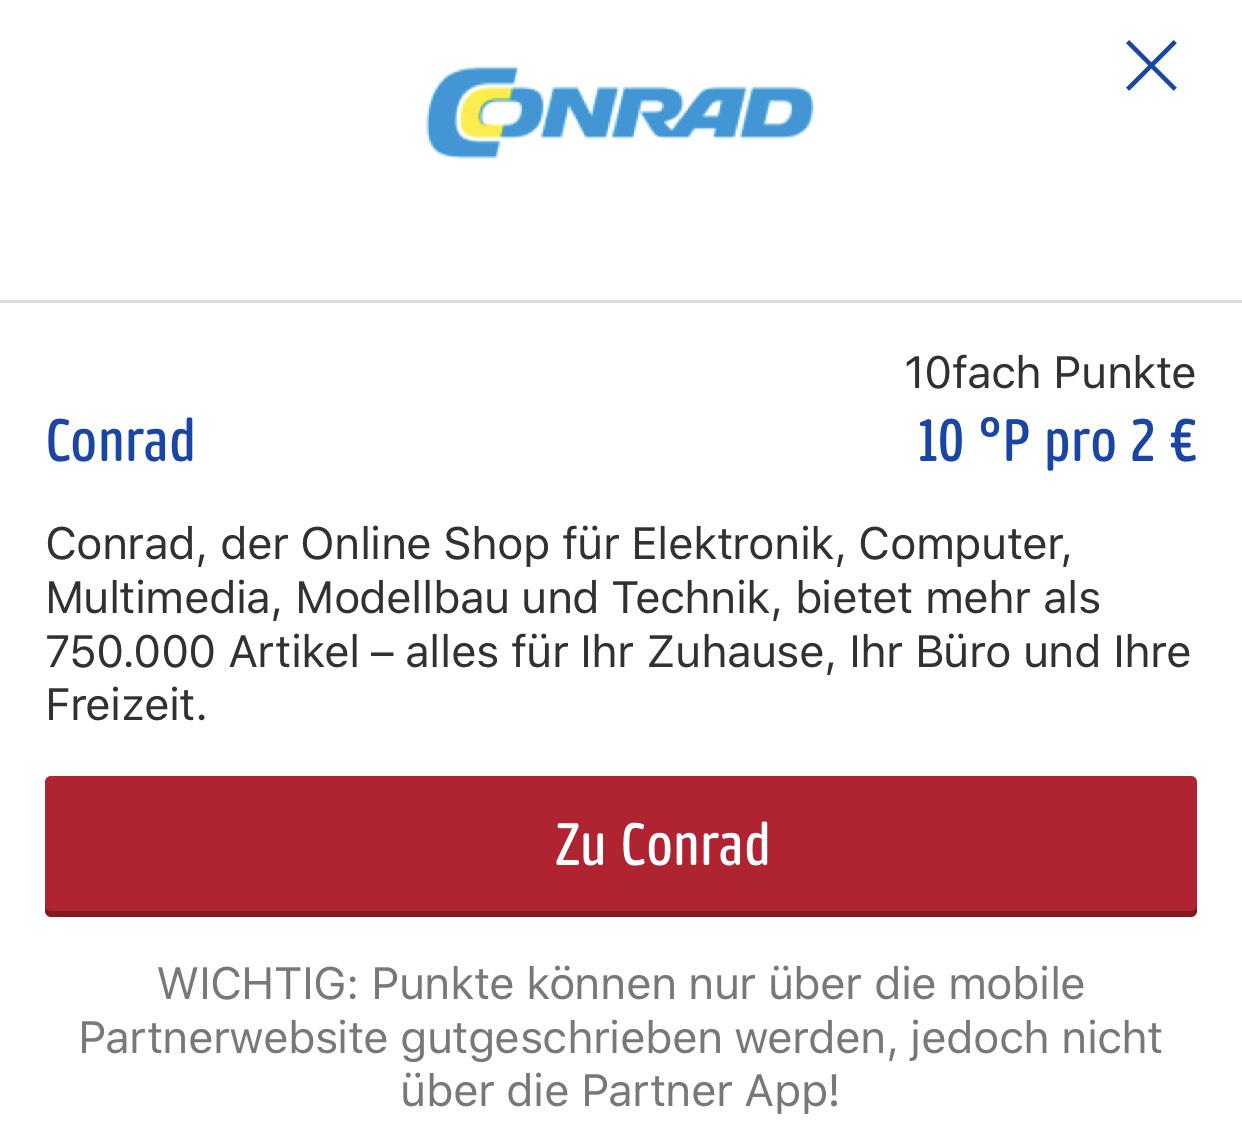 Conrad @Payback 10fach Punkte - kein e-Coupon - unter Shops